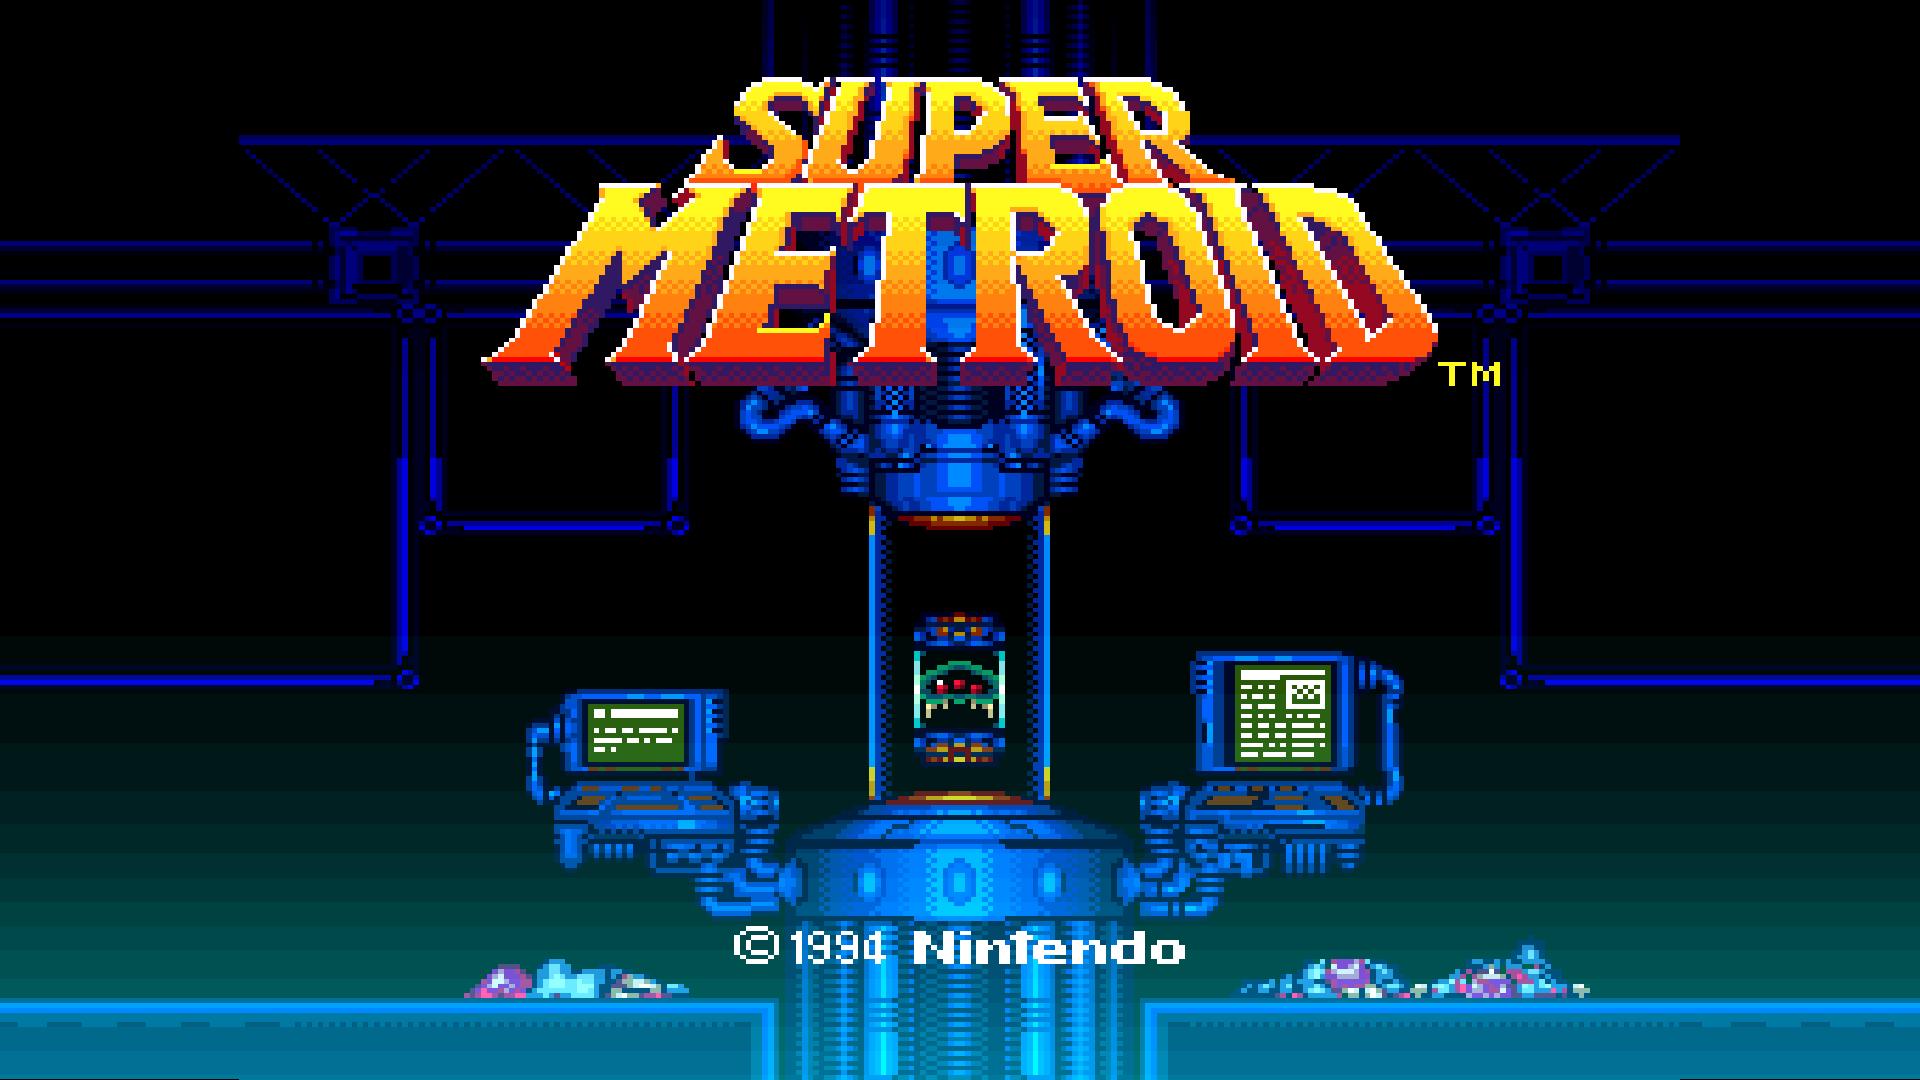 Classic Super Metroid Wallpaper